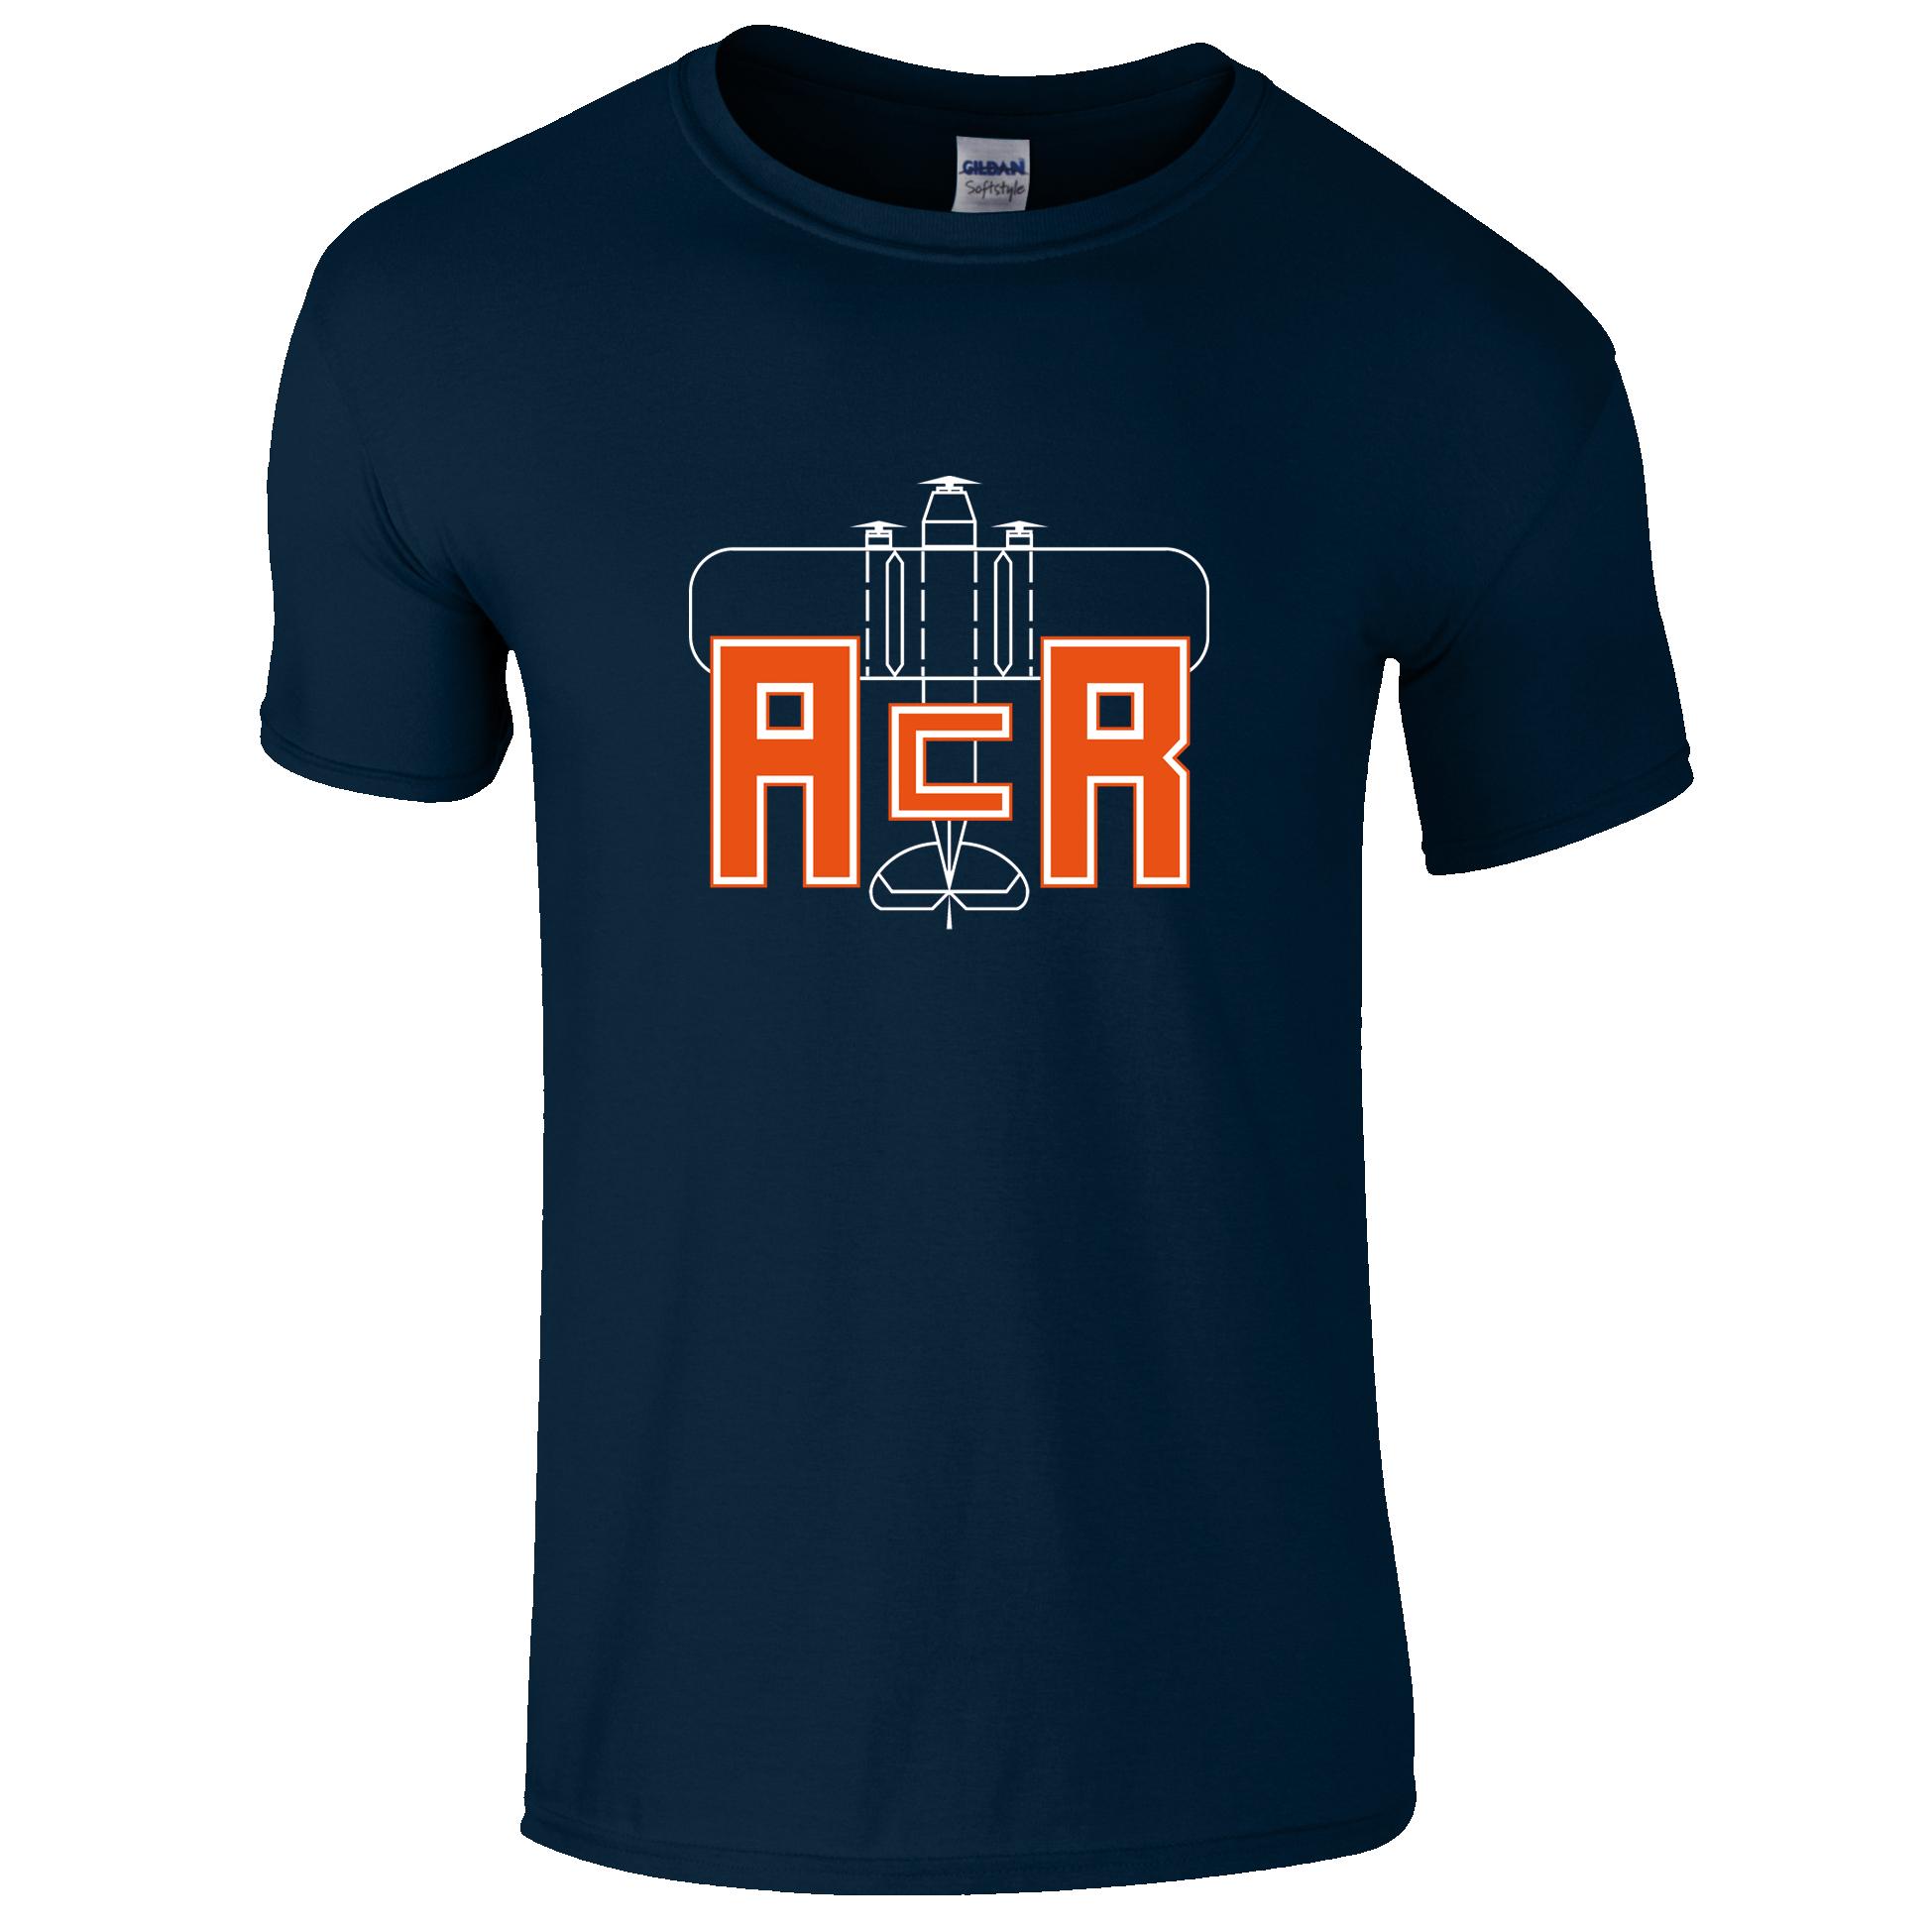 Buy Online ACR Retro Designs - ACR Wild Party Navy T-Shirt